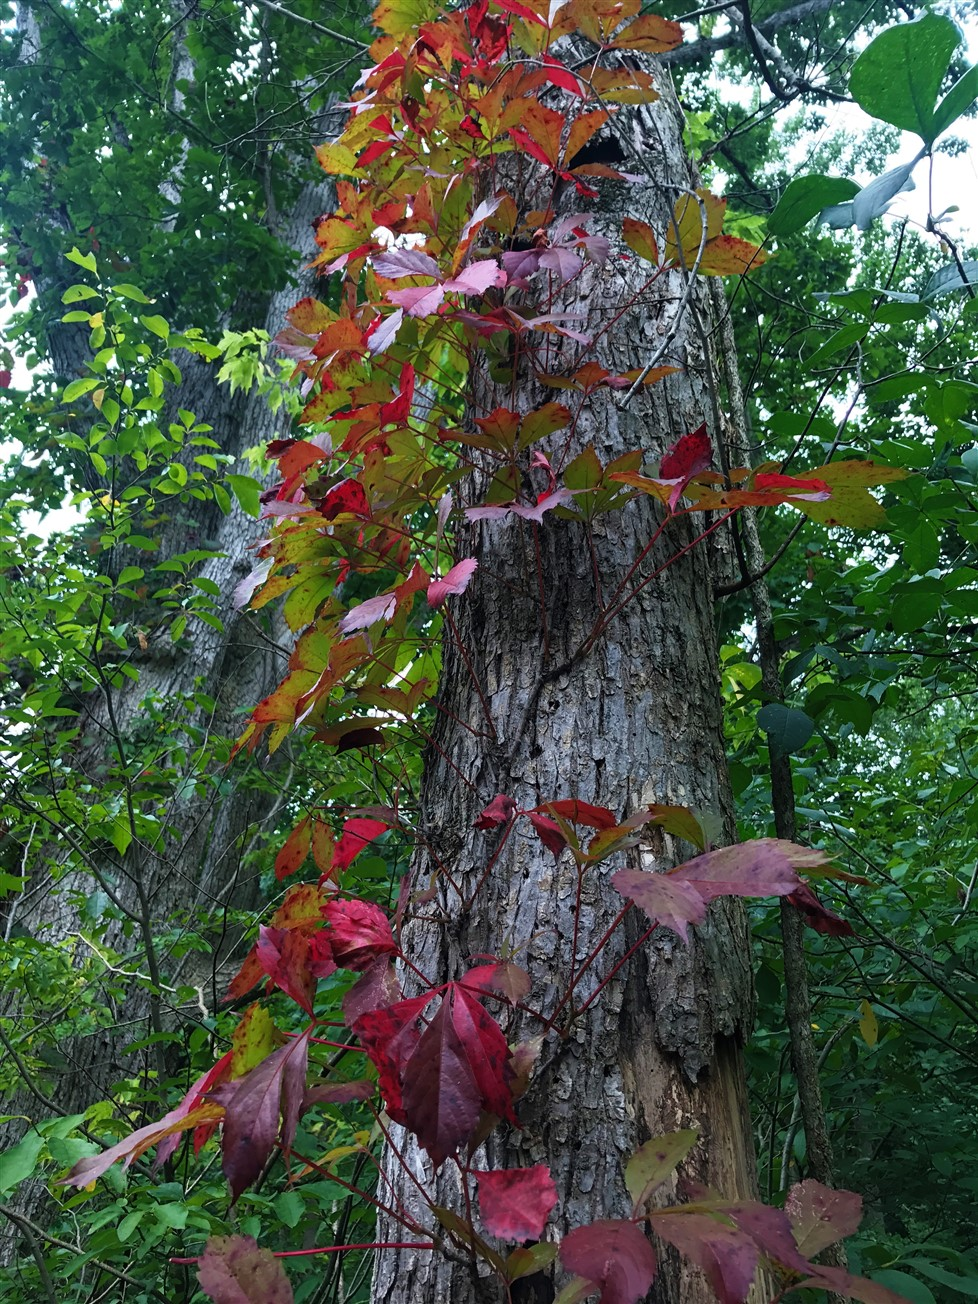 2017 08 06 197 Urbana OH Cedar Bog Nature Preserve.jpg